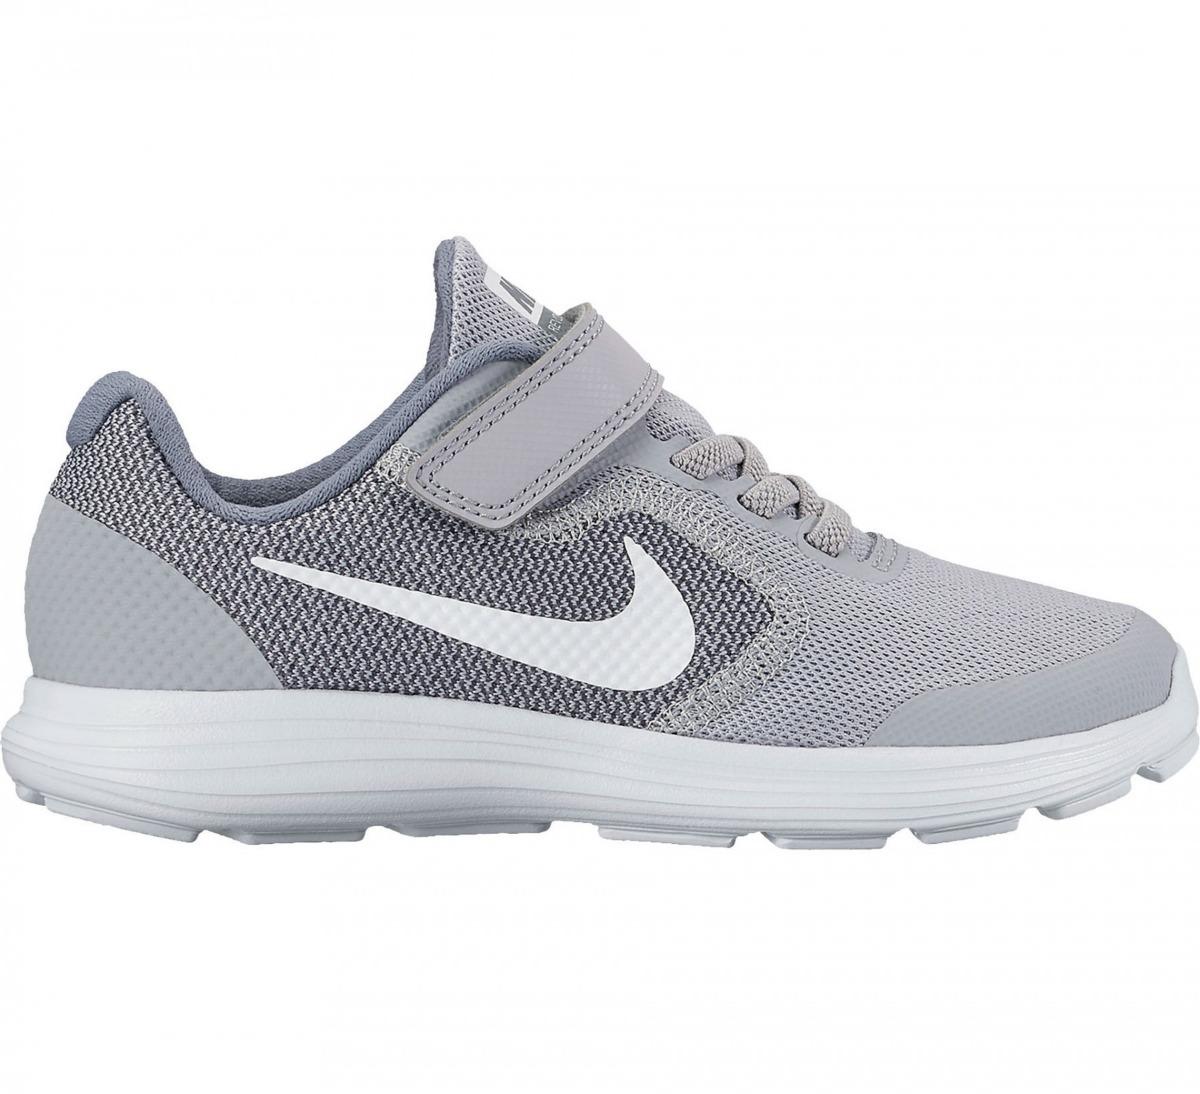 04c1682cbe9 zapatillas nike revolution 3 (psv) niños running 819414-008. Cargando zoom.